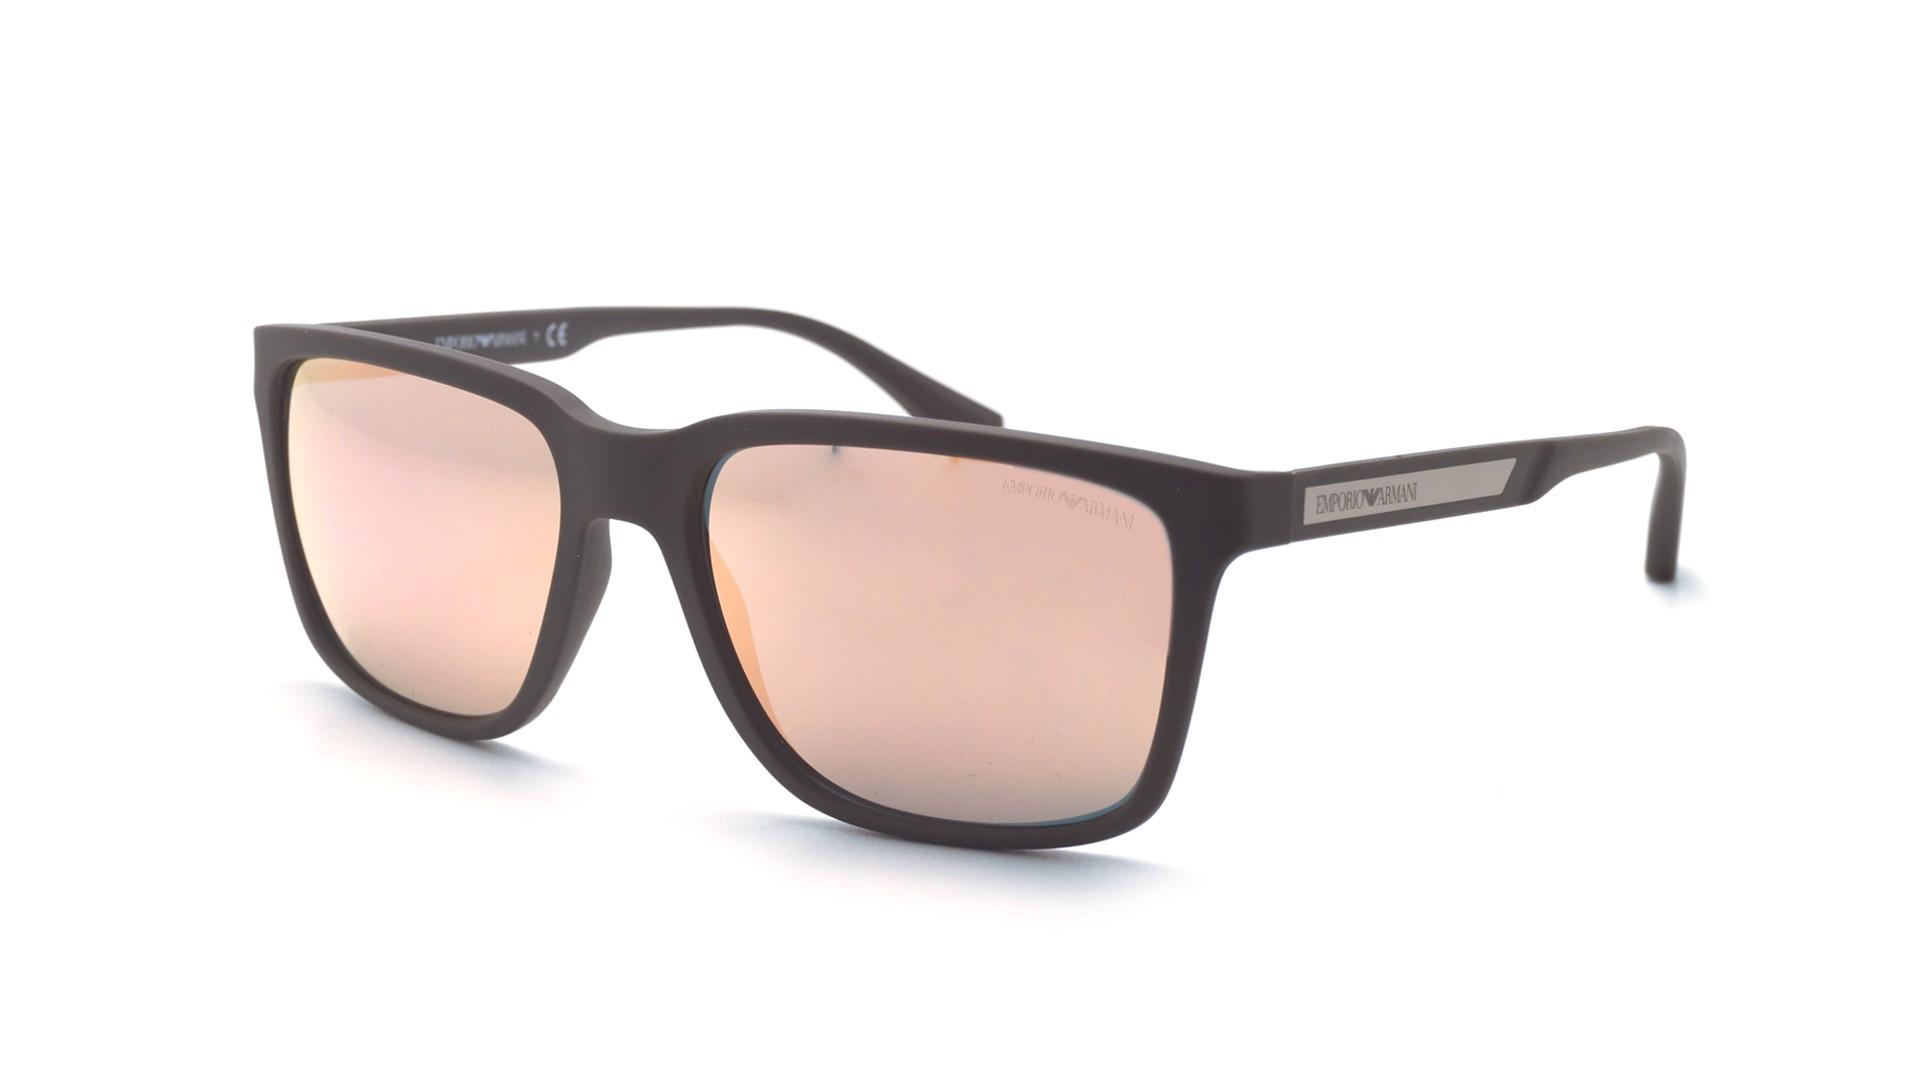 aaae4f7b8ea6 Sunglasses Emporio Armani EA4047 53054Z 56-17 Brown Matte Large Mirror